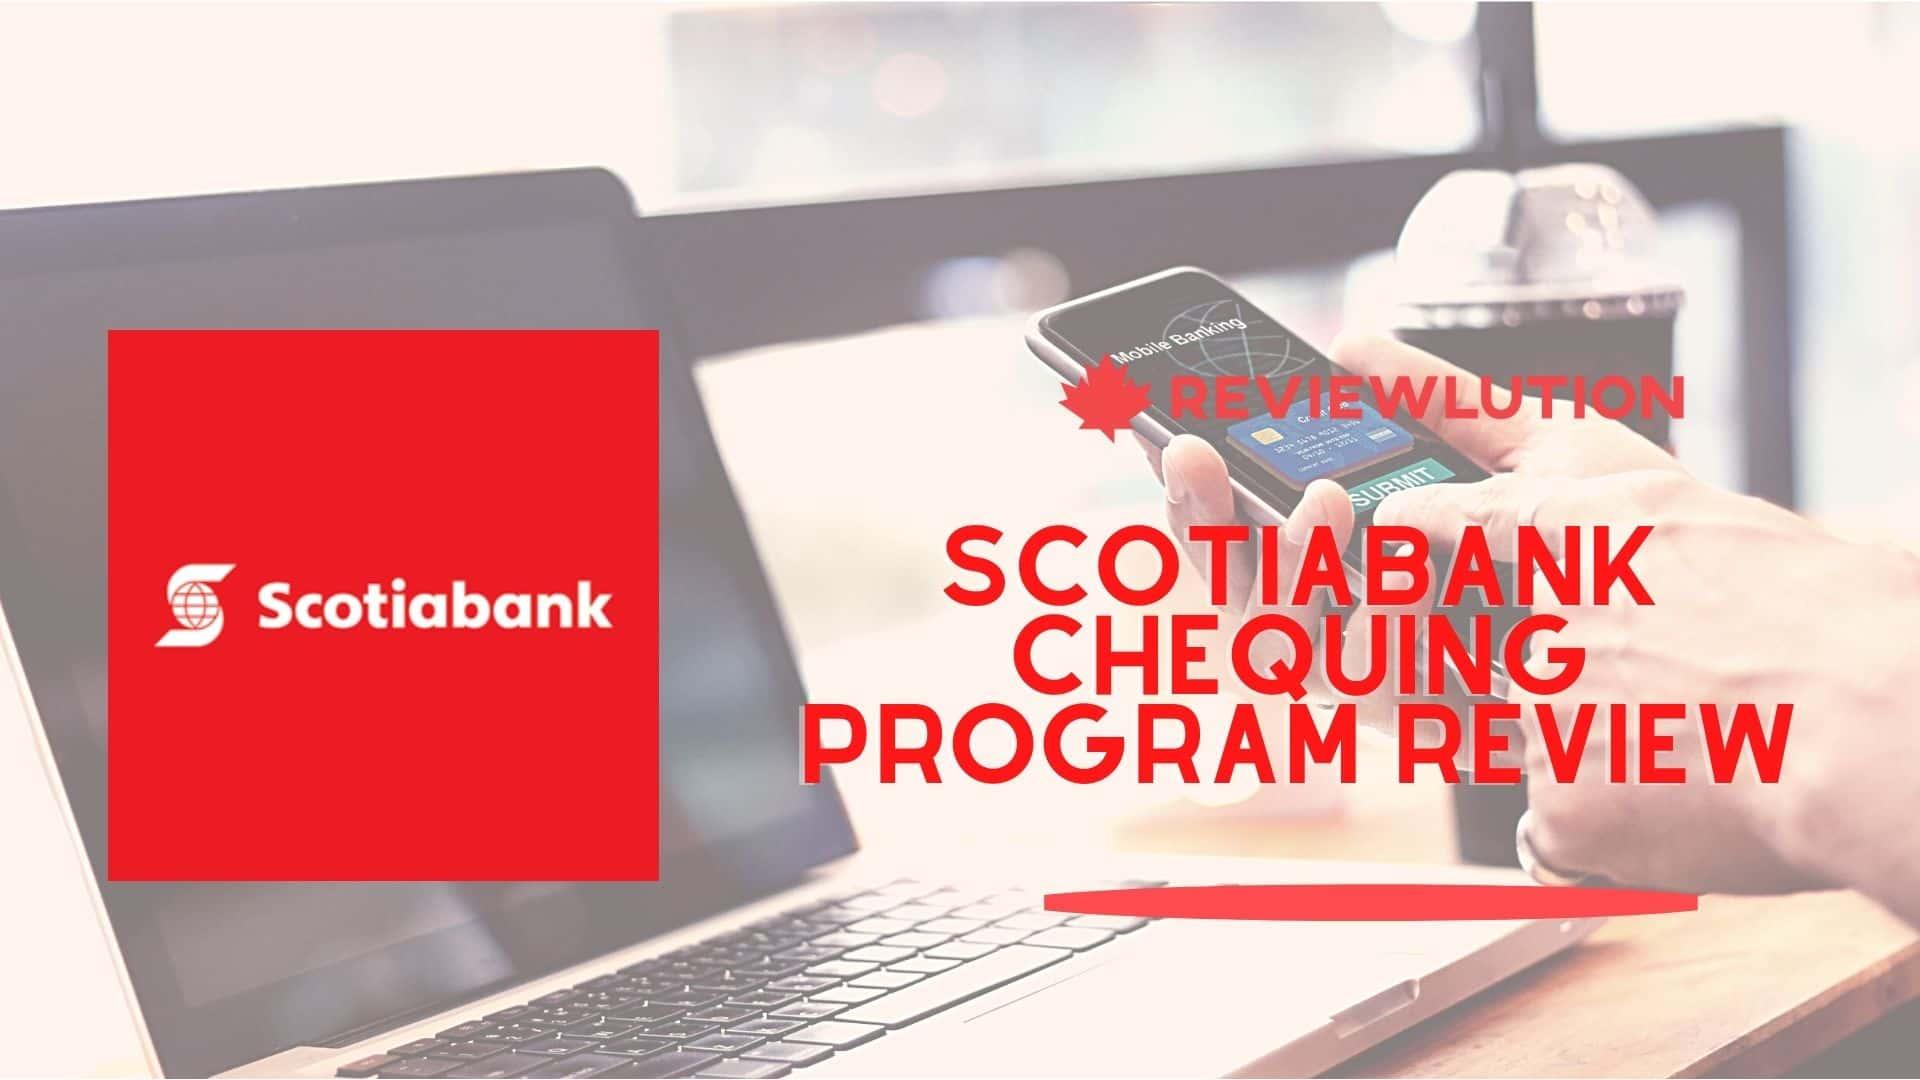 Scotiabank Chequing Program